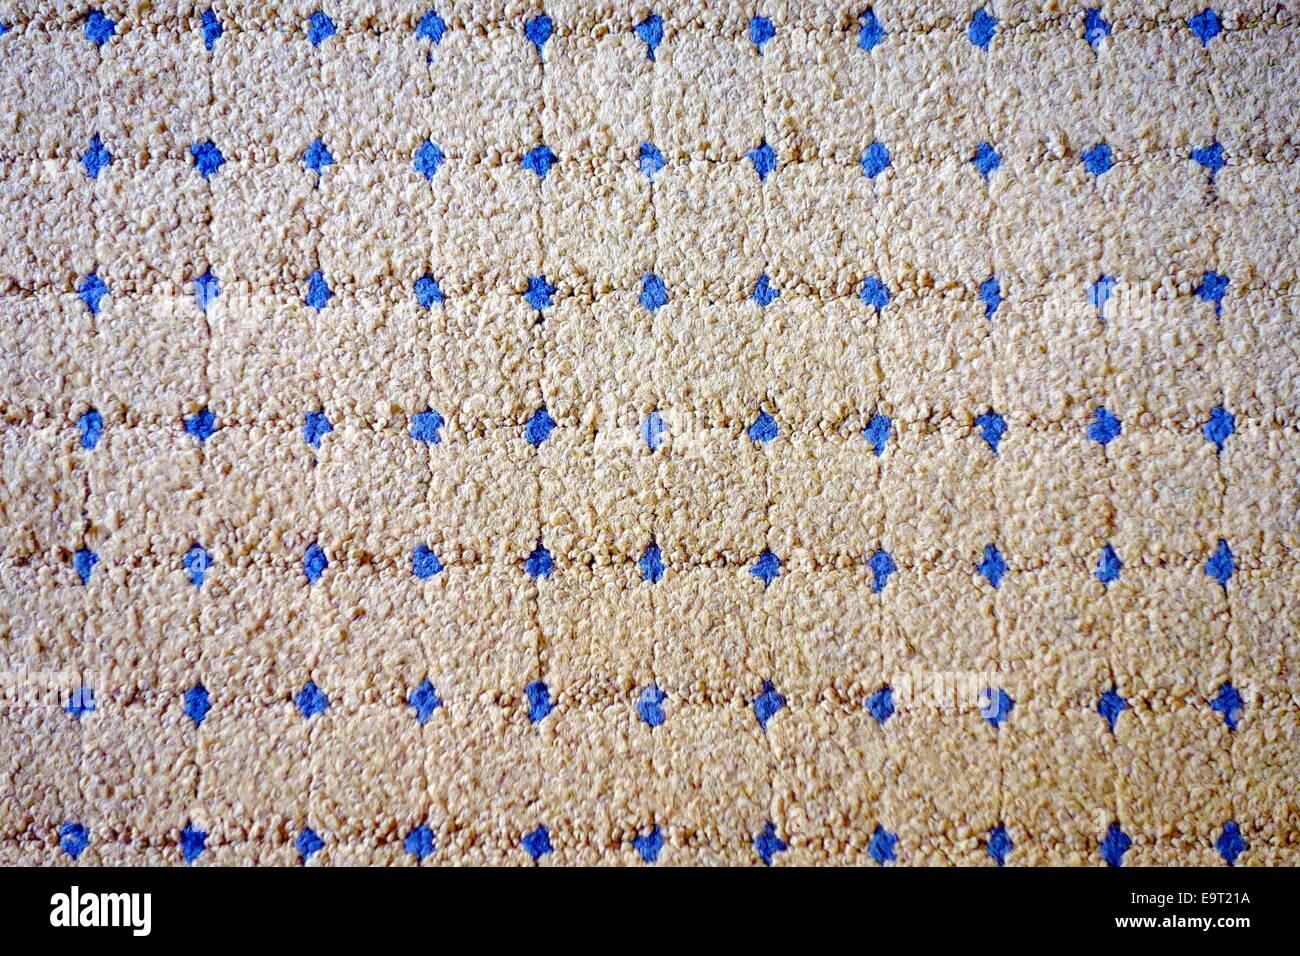 Patterned design of a carpet - Stock Image